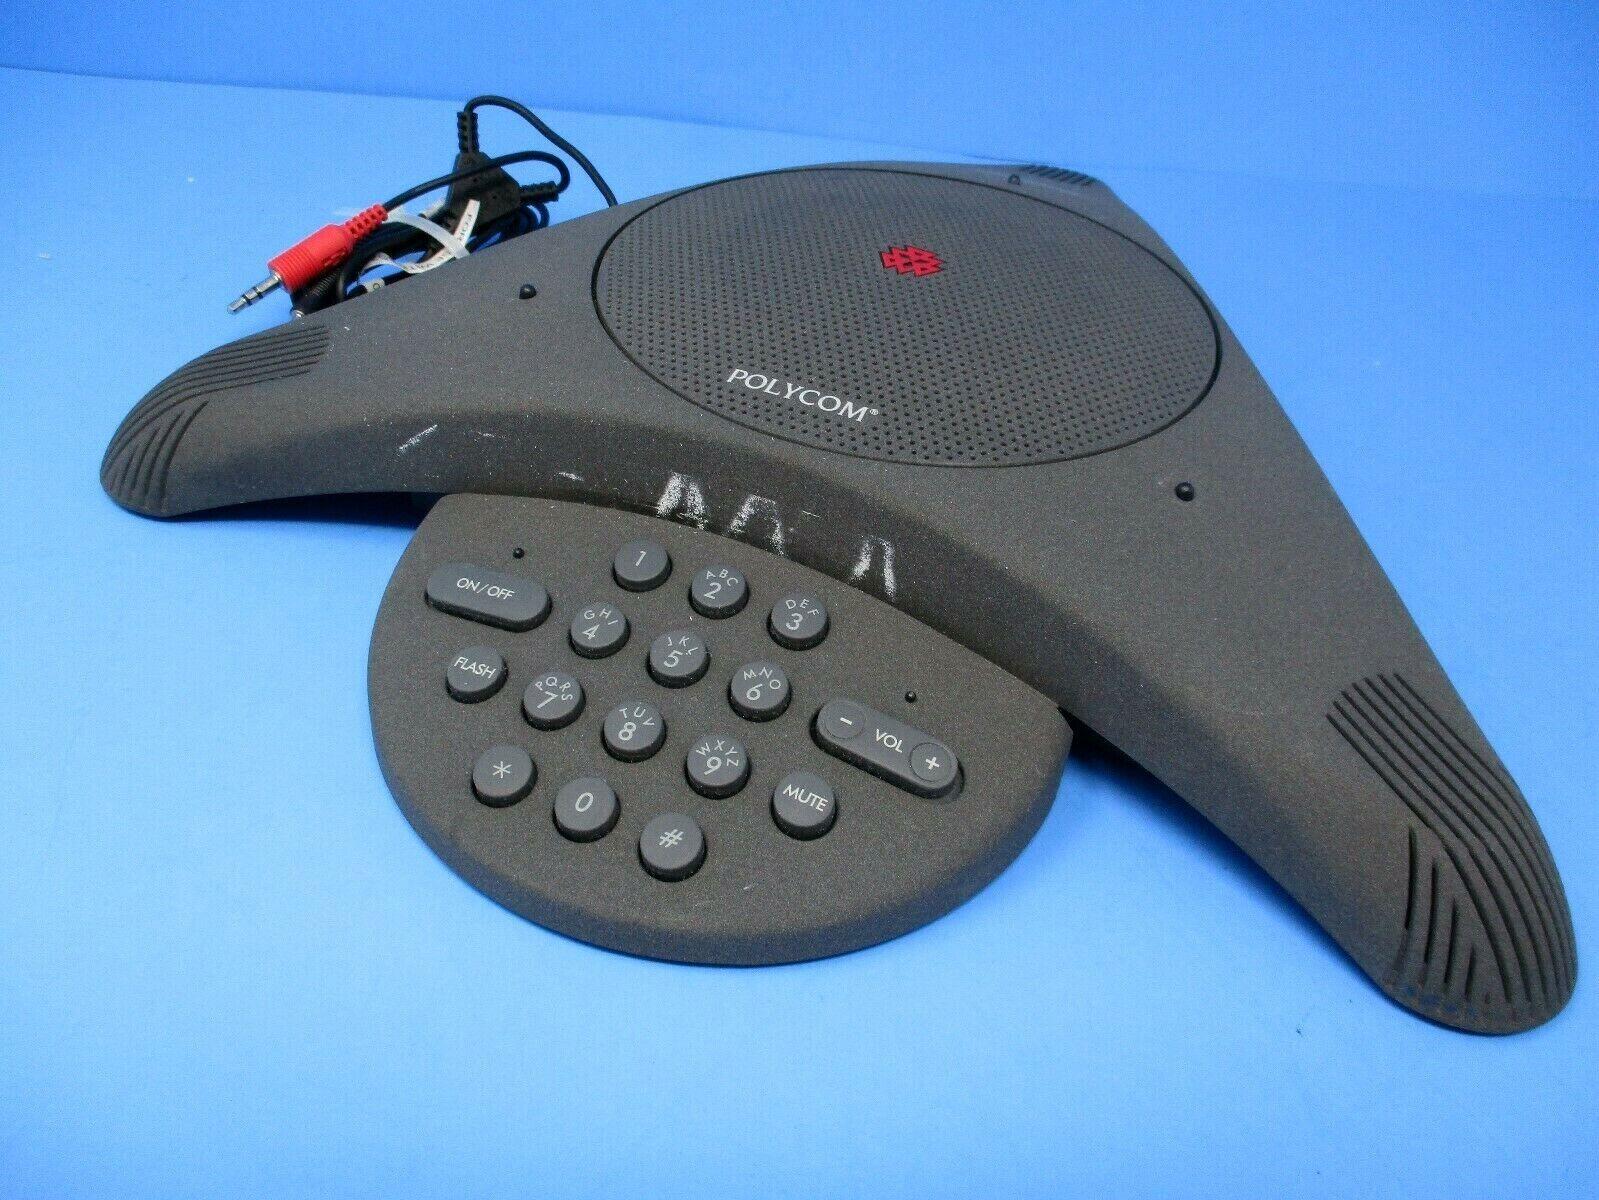 Polycom Soundstation2 Full Duplex Conference Phone 2200-16200-001